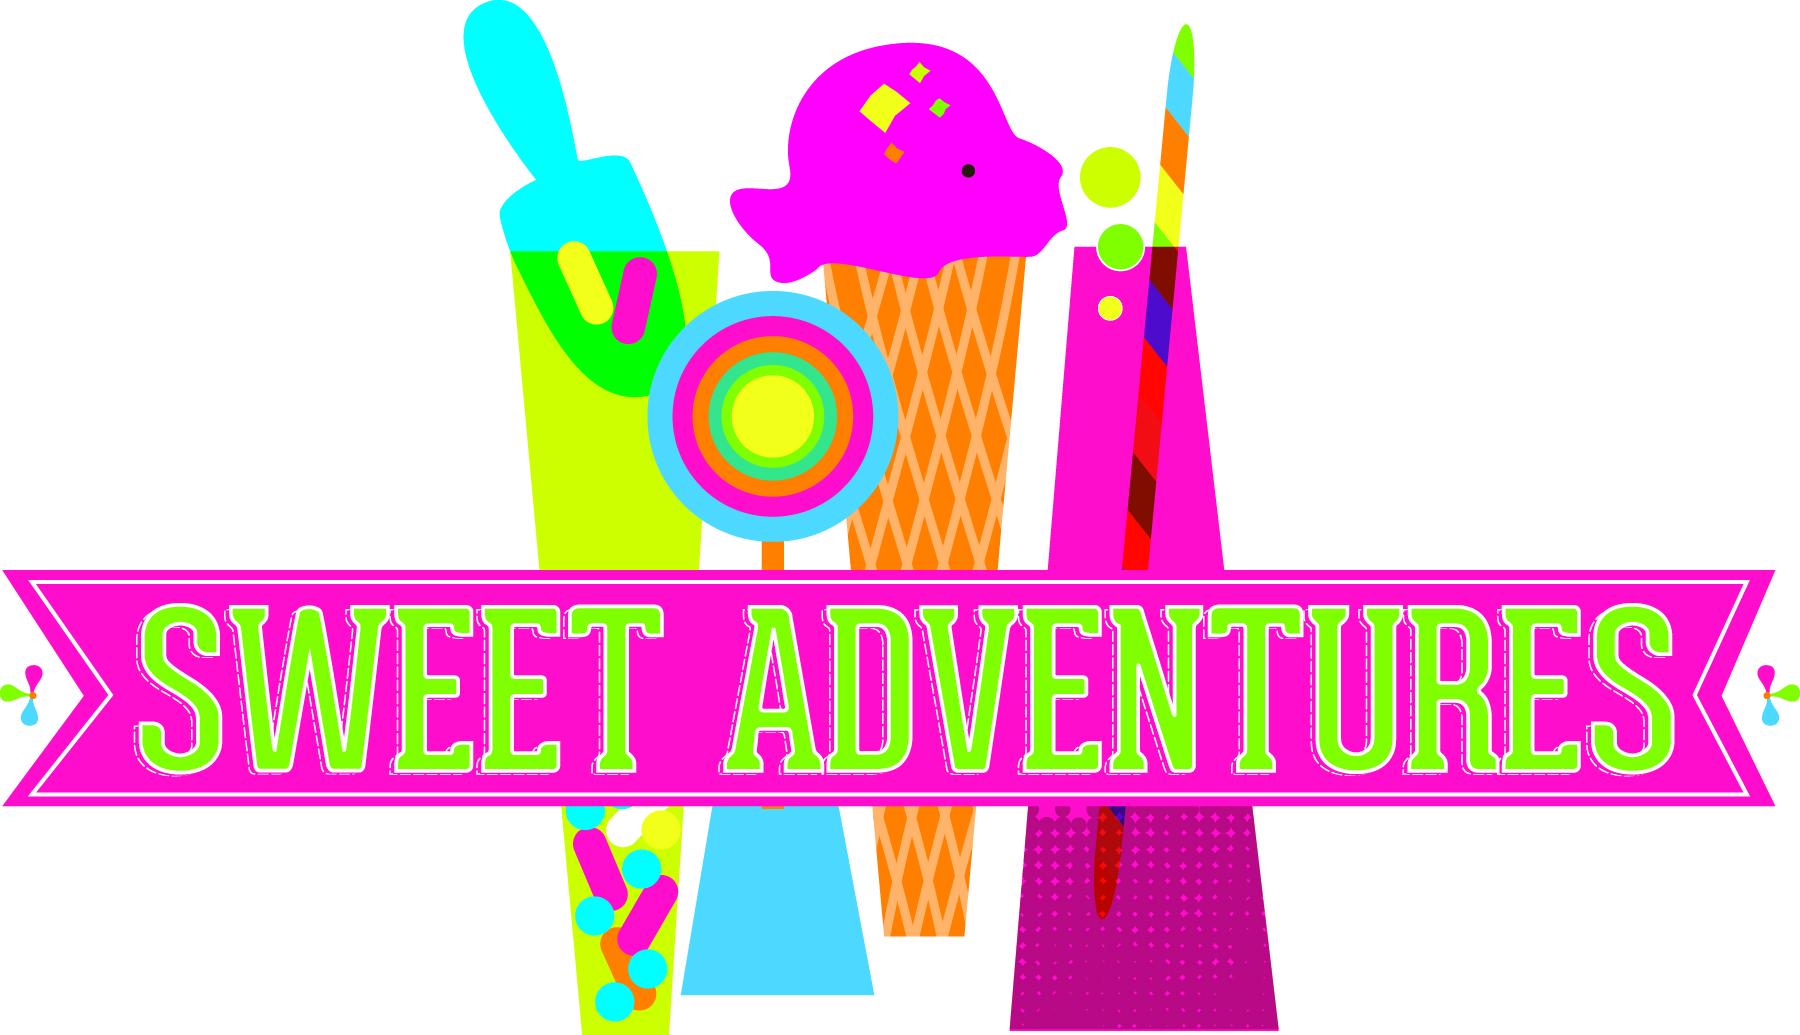 Sweet Adventures Ice Cream Glenwood Springs